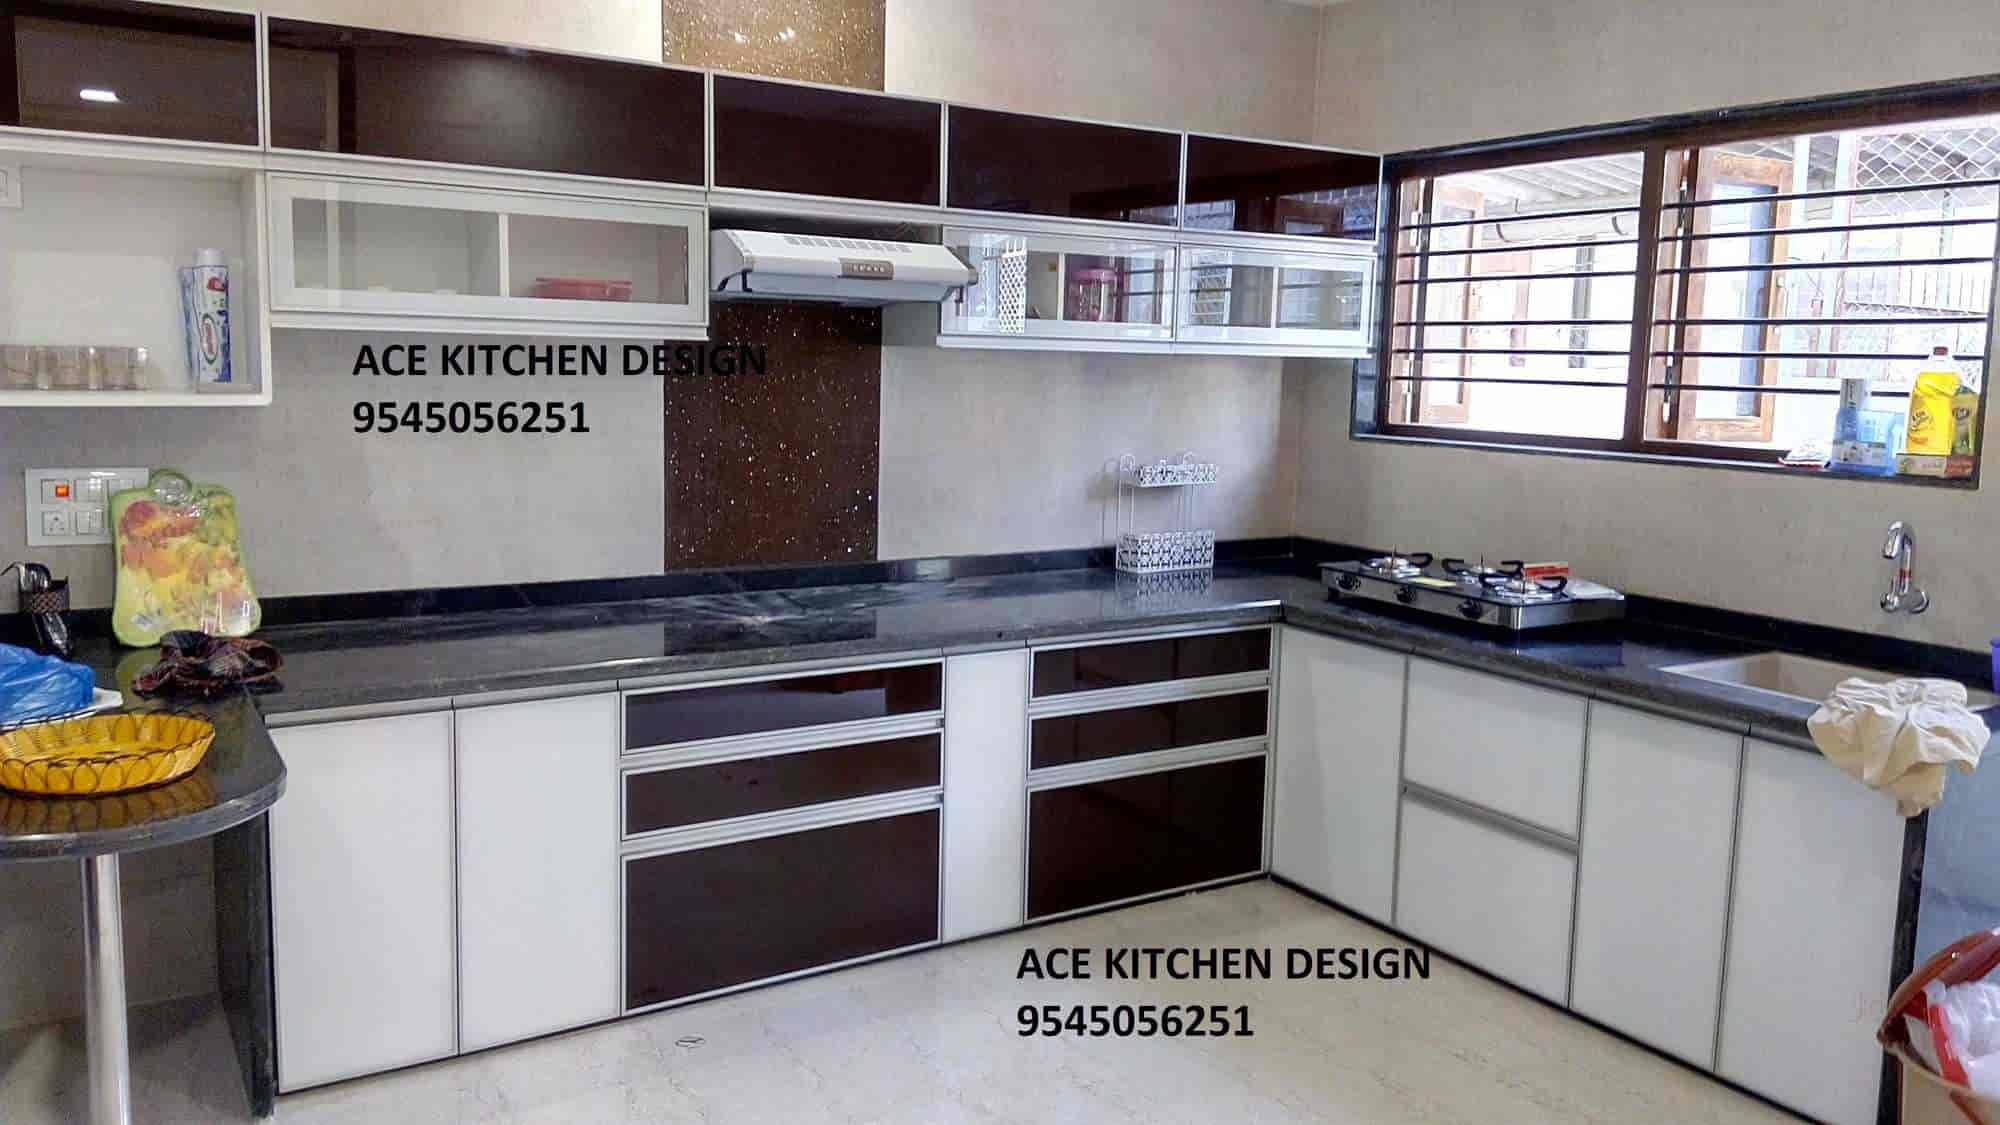 Ace Kitchen Design, Malad West   Modular Kitchen Dealers In Mumbai    Justdial